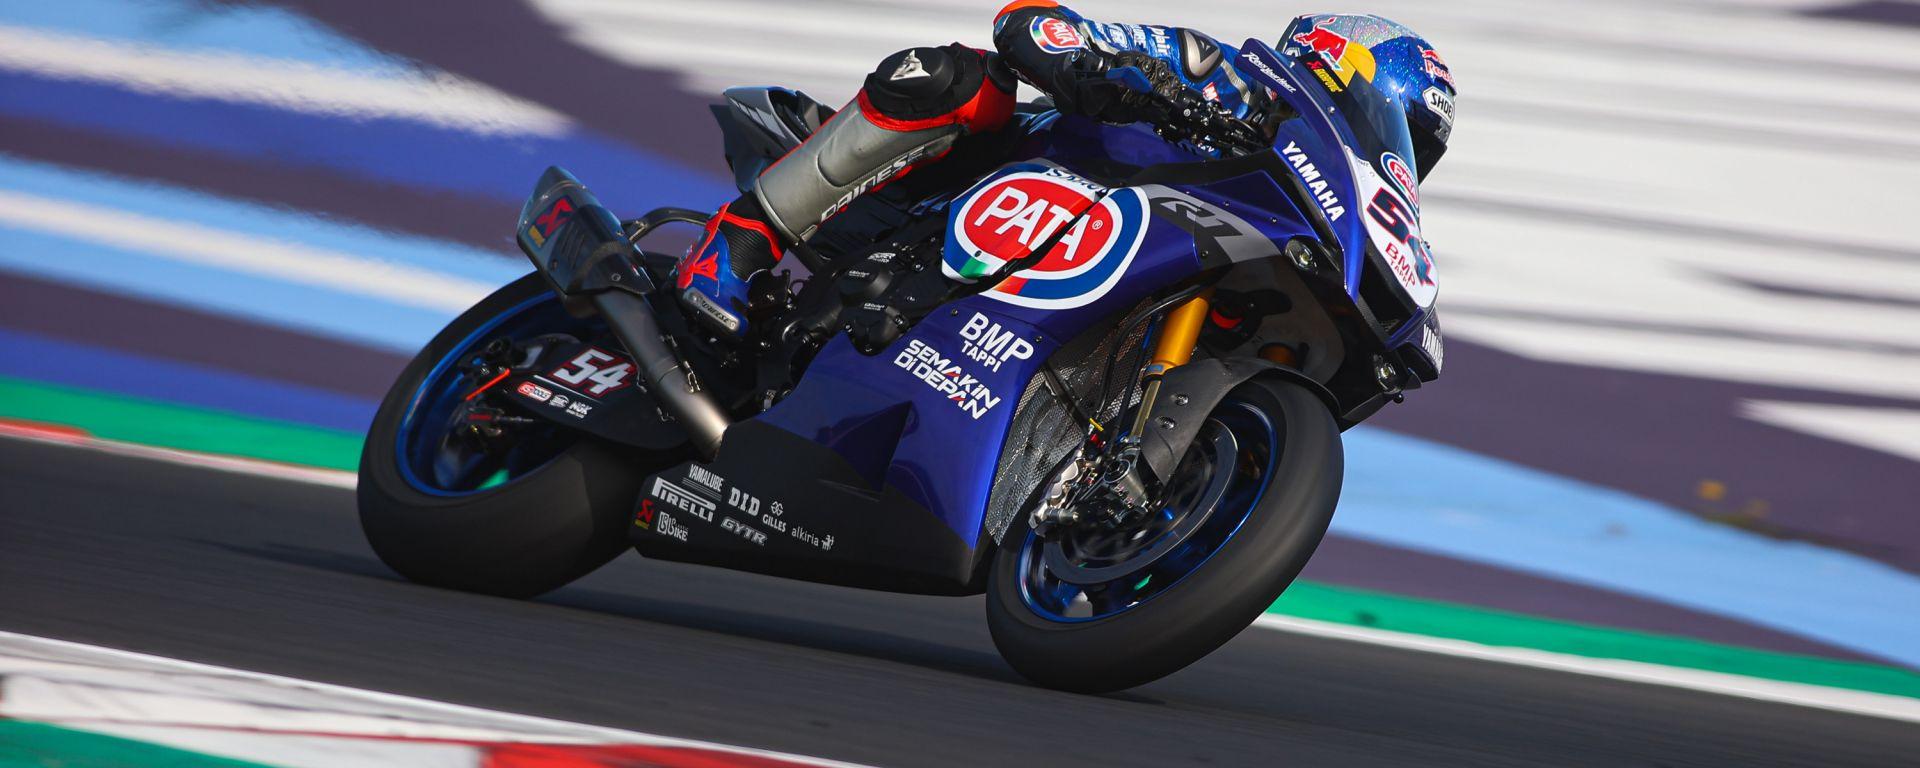 Superbike Test Misano 2021, Toprak Razgatlioglu (Ducati)